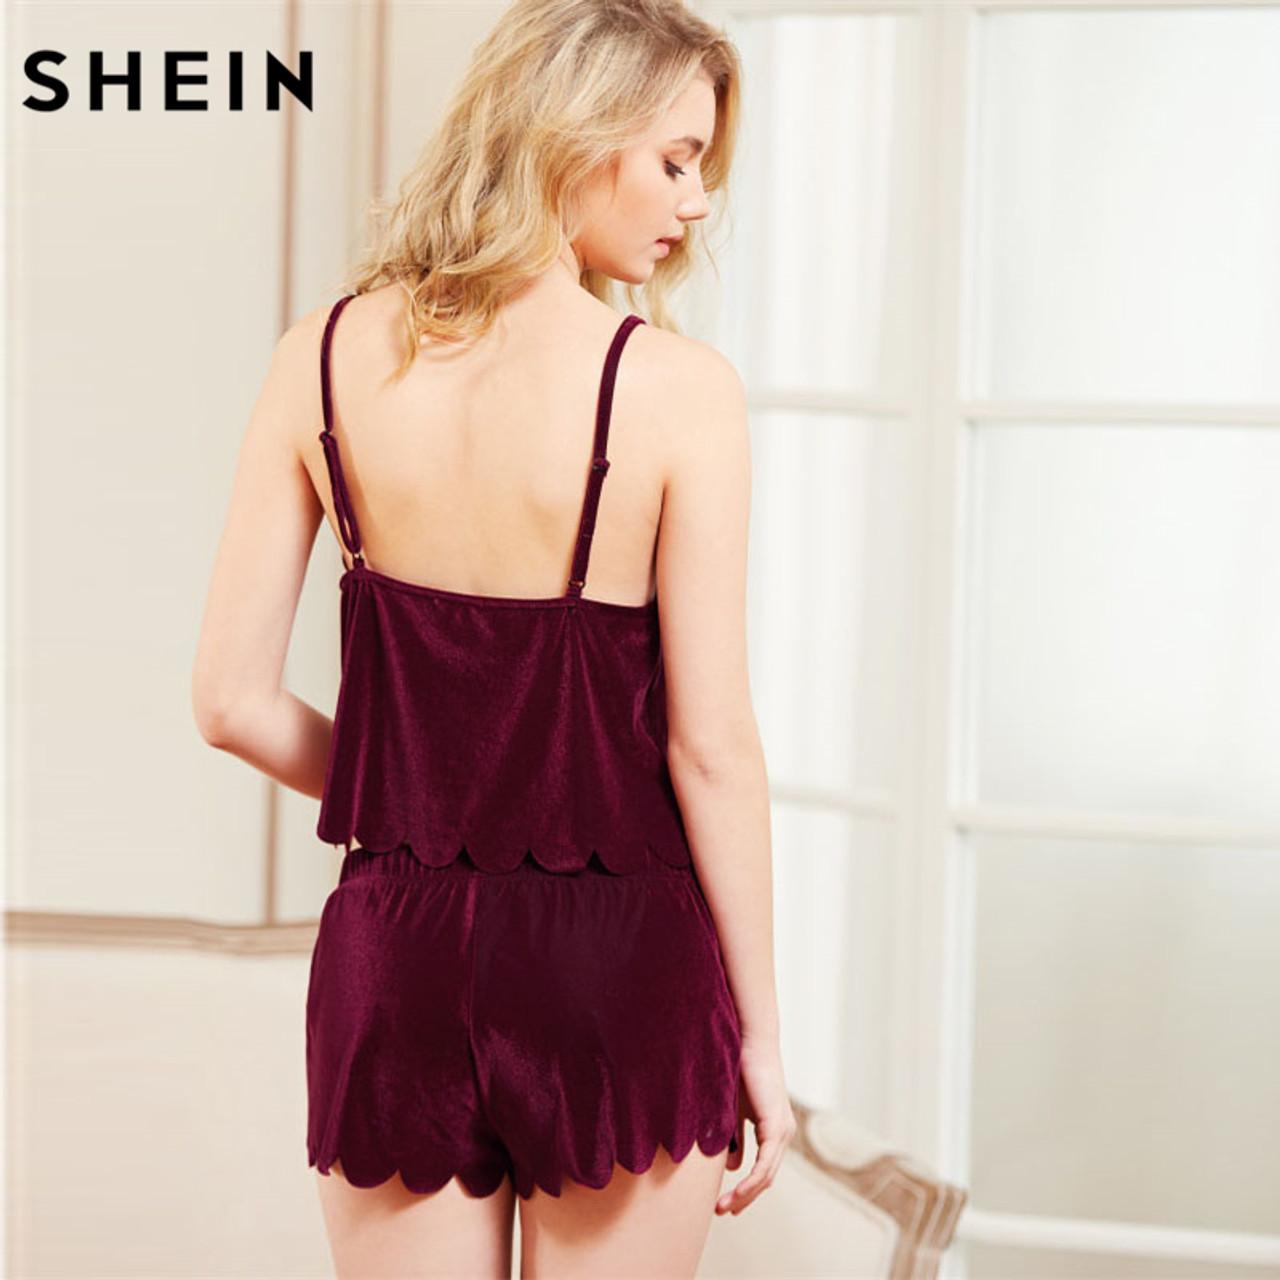 96d780fdf9b ... SHEIN Women Sleeping Summer Nightwear Pyjama Burgundy Spaghetti Strap  Scalloped Trim Velvet Cami Top  amp  ...